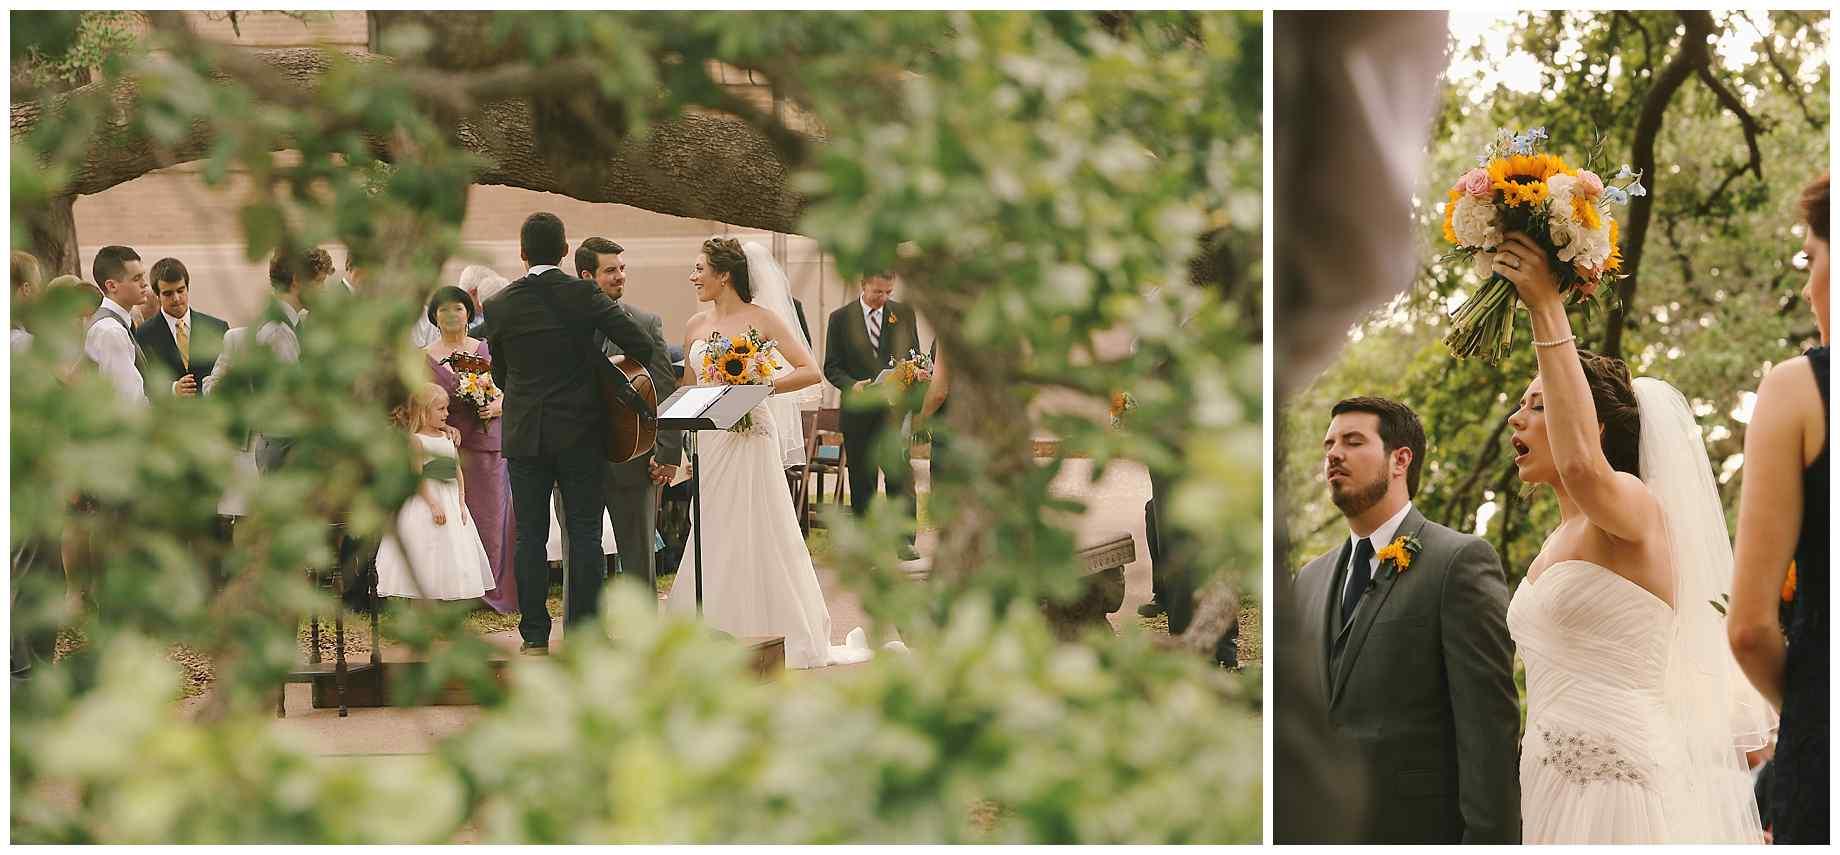 aggie-century-tree-wedding-12